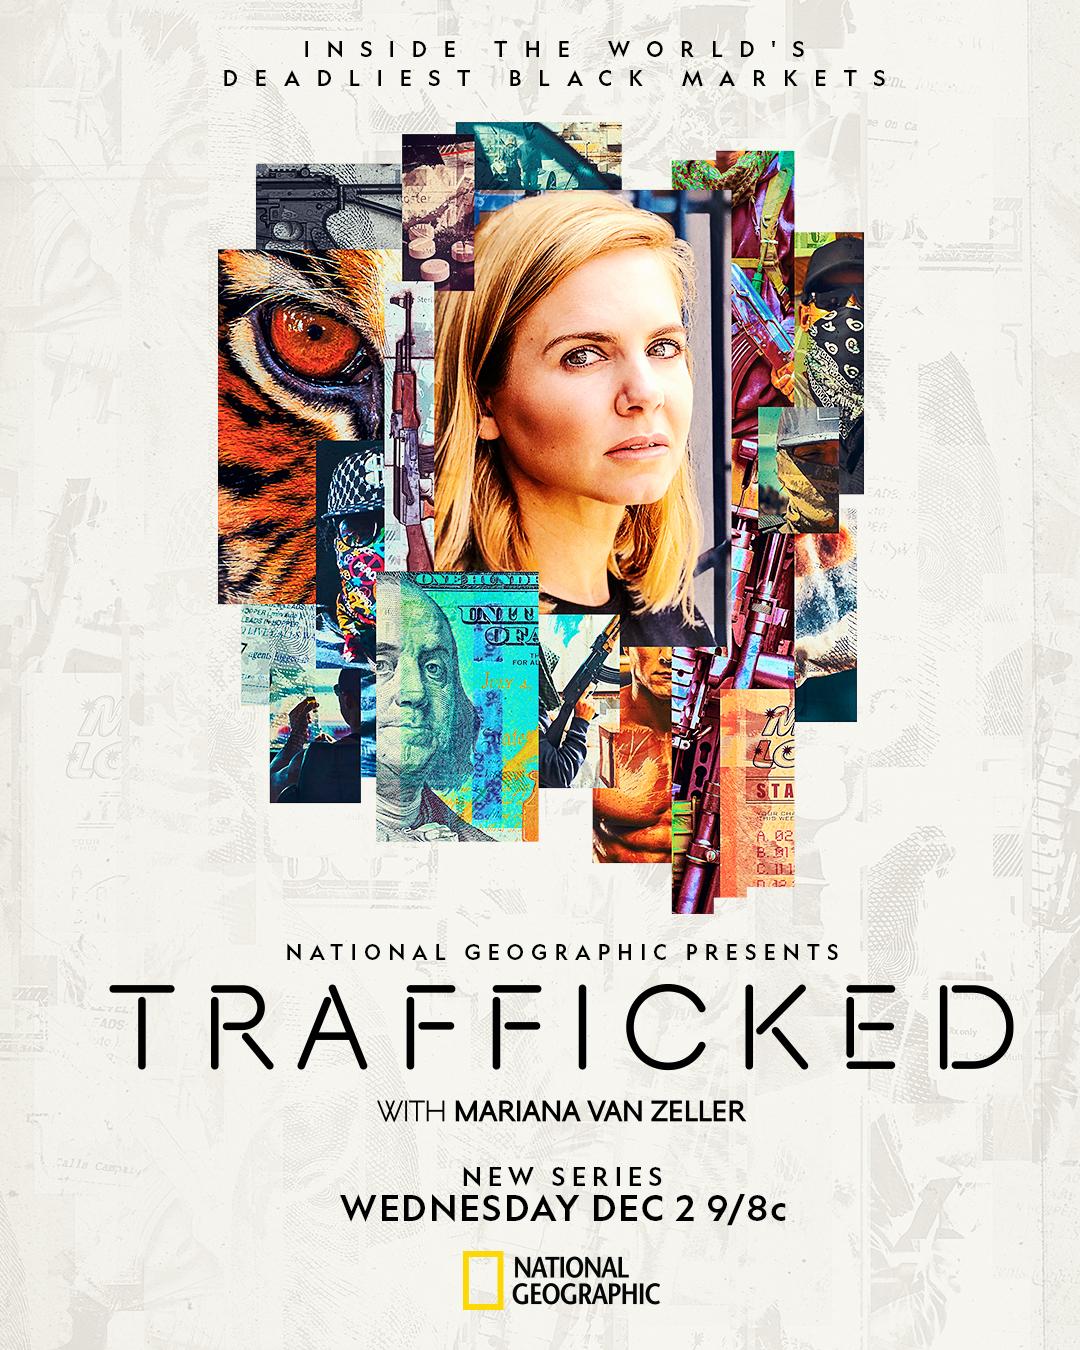 Trafficked.with.Mariana.van.Zeller.S01E00.Mariana.Van.Zeller.Investigates.720p.WEBRip.x264-CAFFEiNE